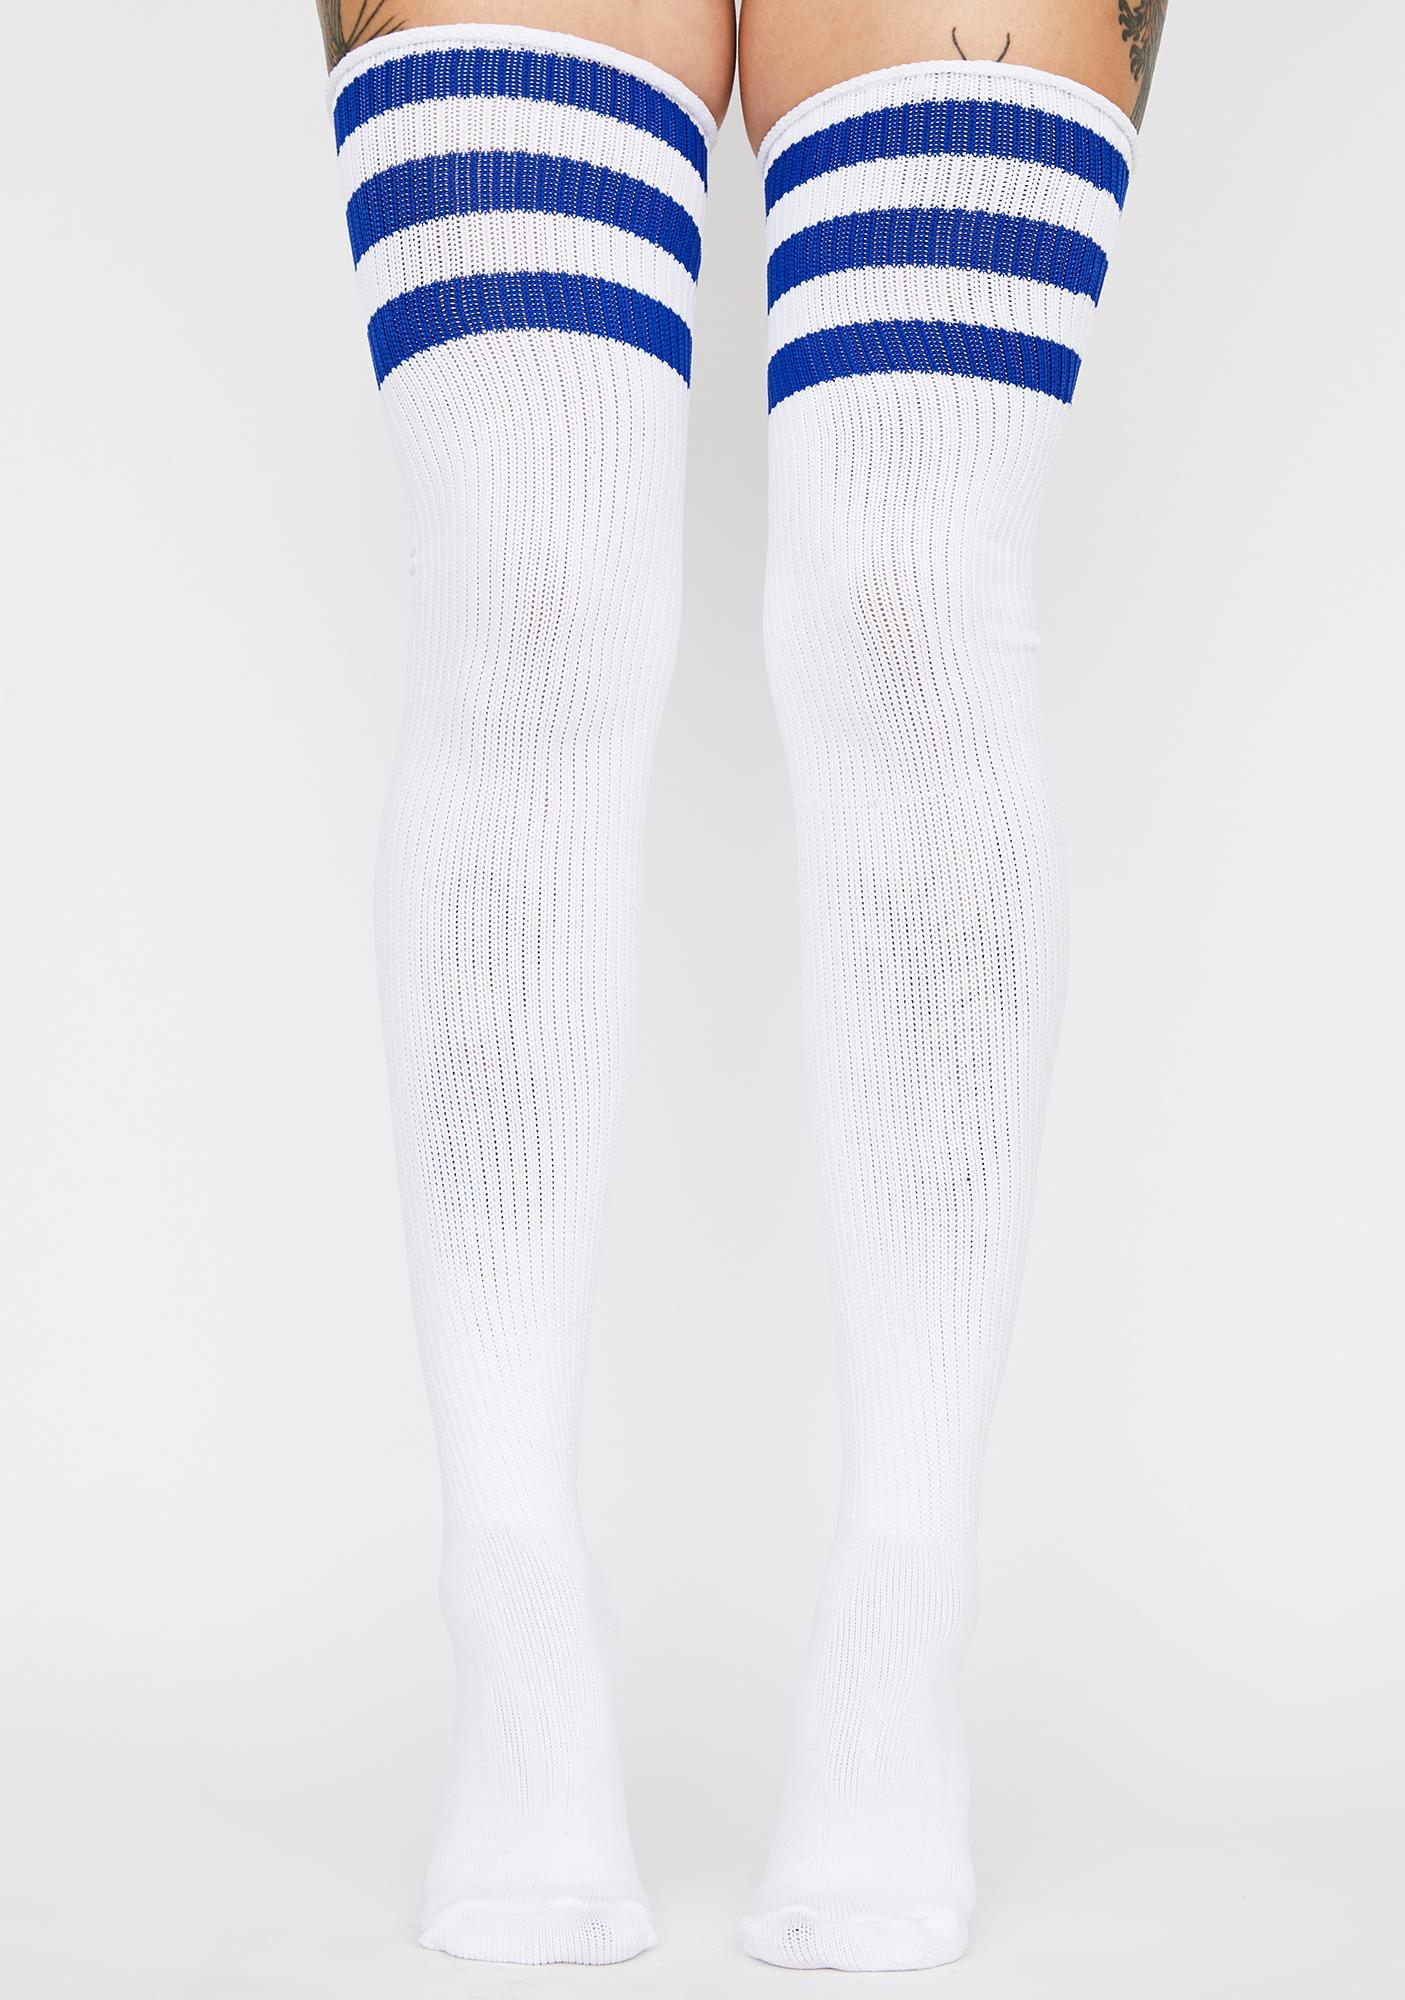 Royal Babe Team Striped Thigh Highs